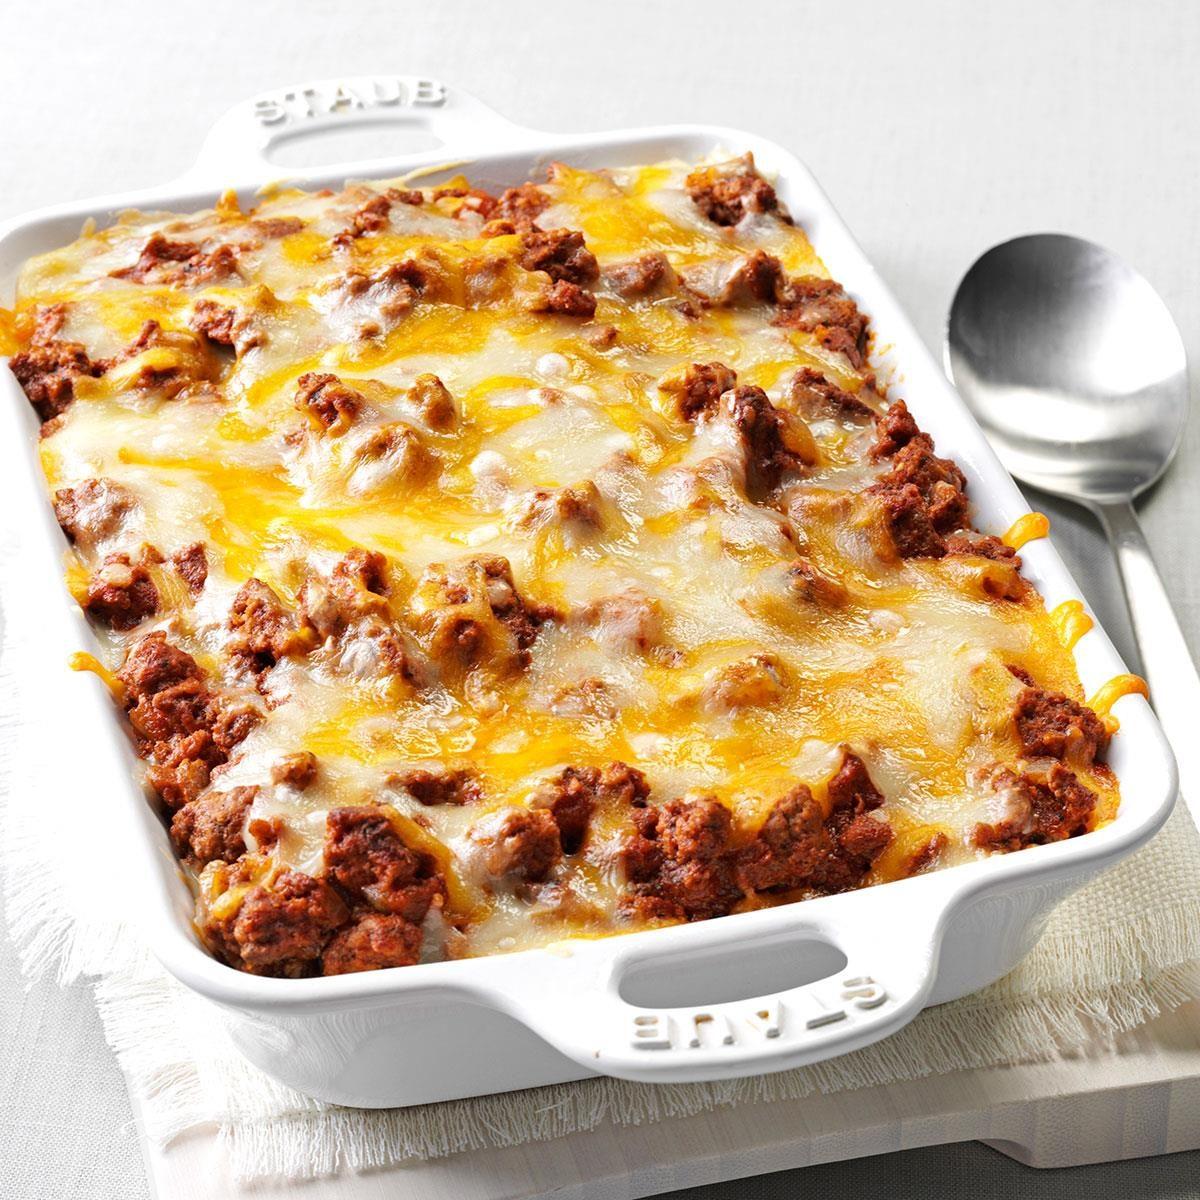 Spaghetti Pie Casserole Exps161692 Th2379807a10 31 9bc Rms 13